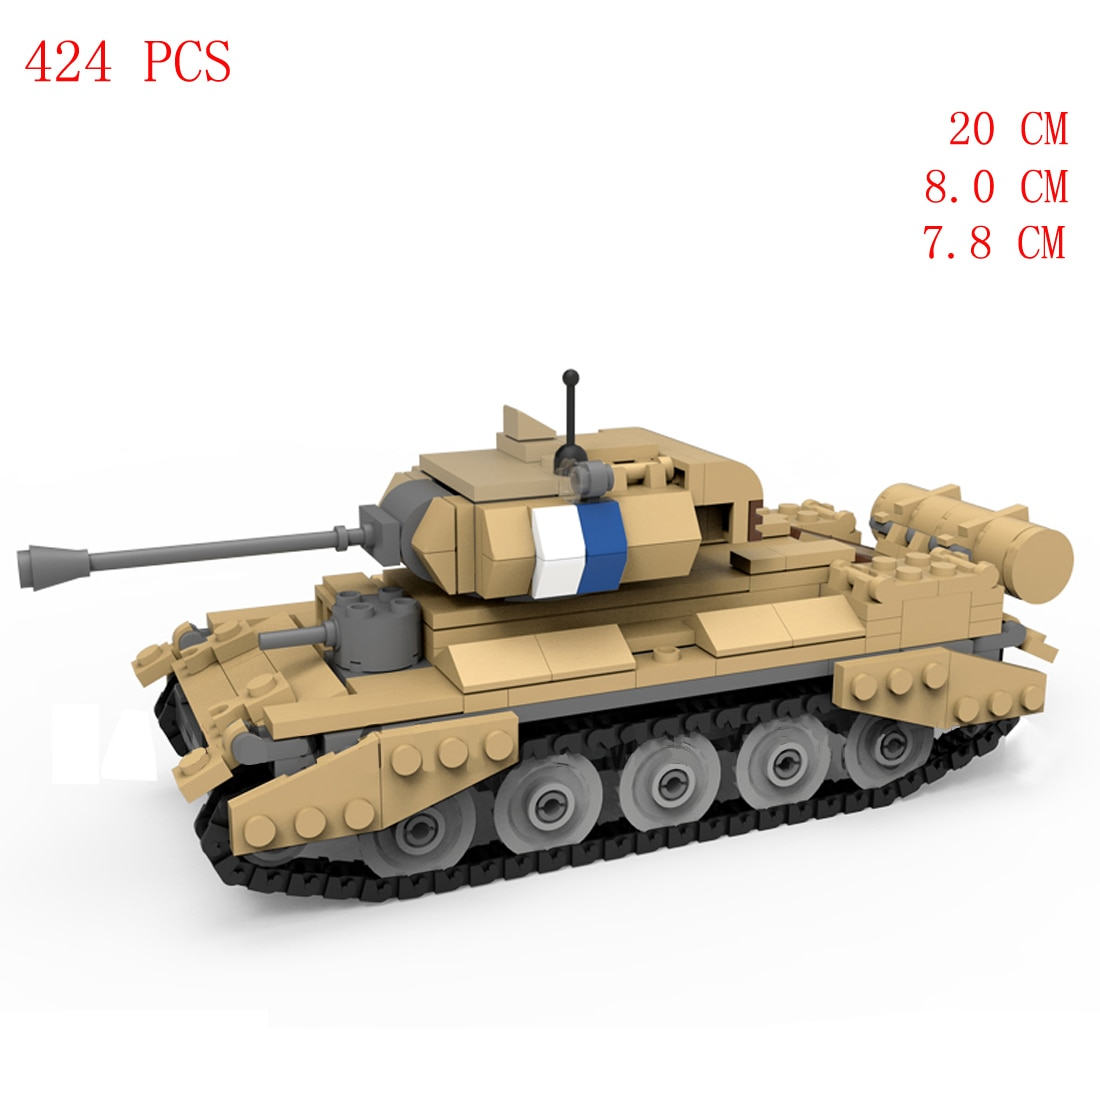 Купить с кэшбэком hot military WWII German Army VS UK Crusader cruise tank vehicles North Africa war equipment Building Blocks weapons bricks toys